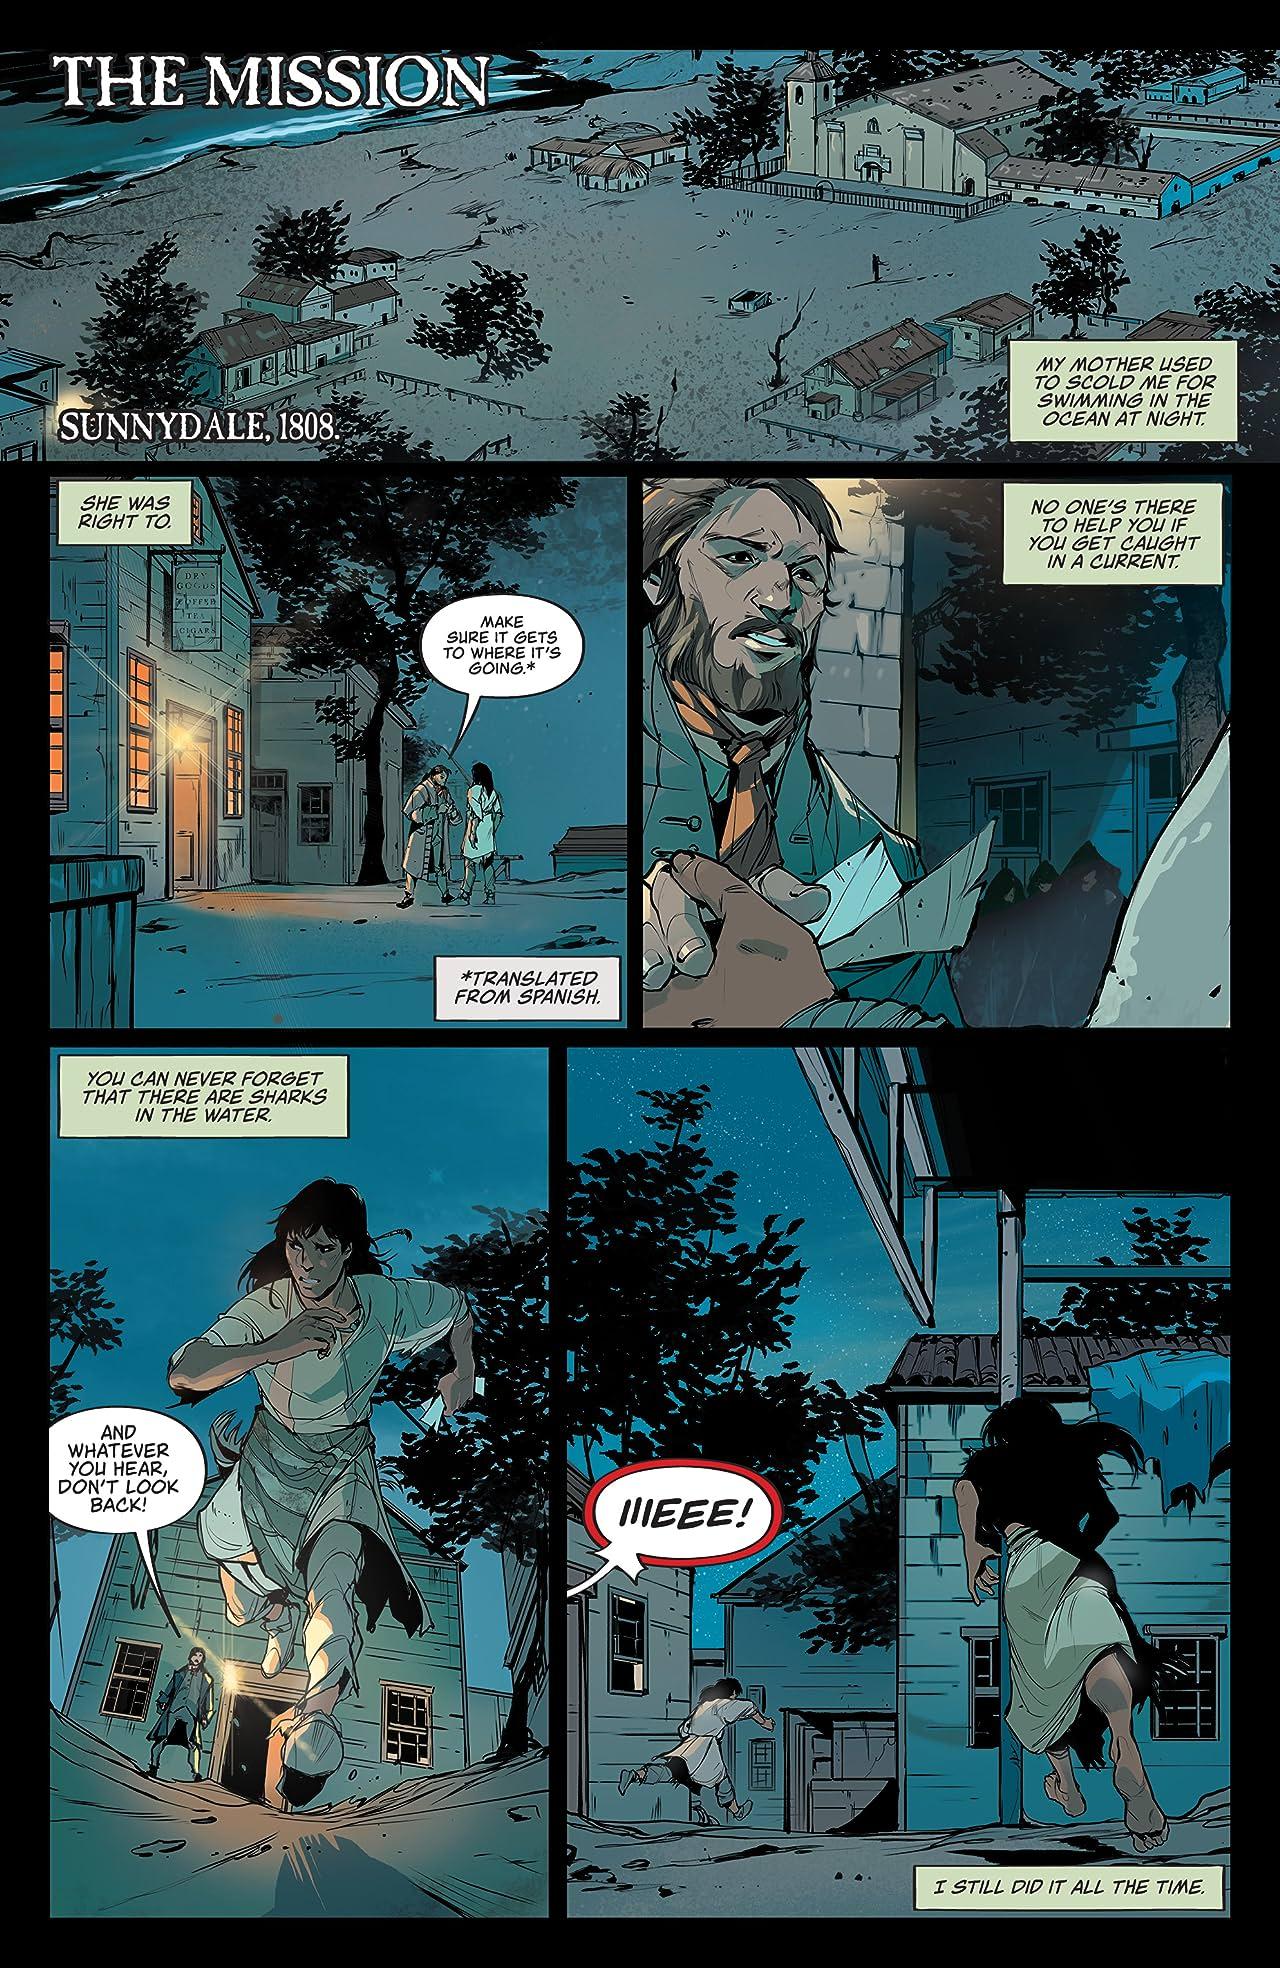 Buffy the Vampire Slayer: Chosen Ones #1